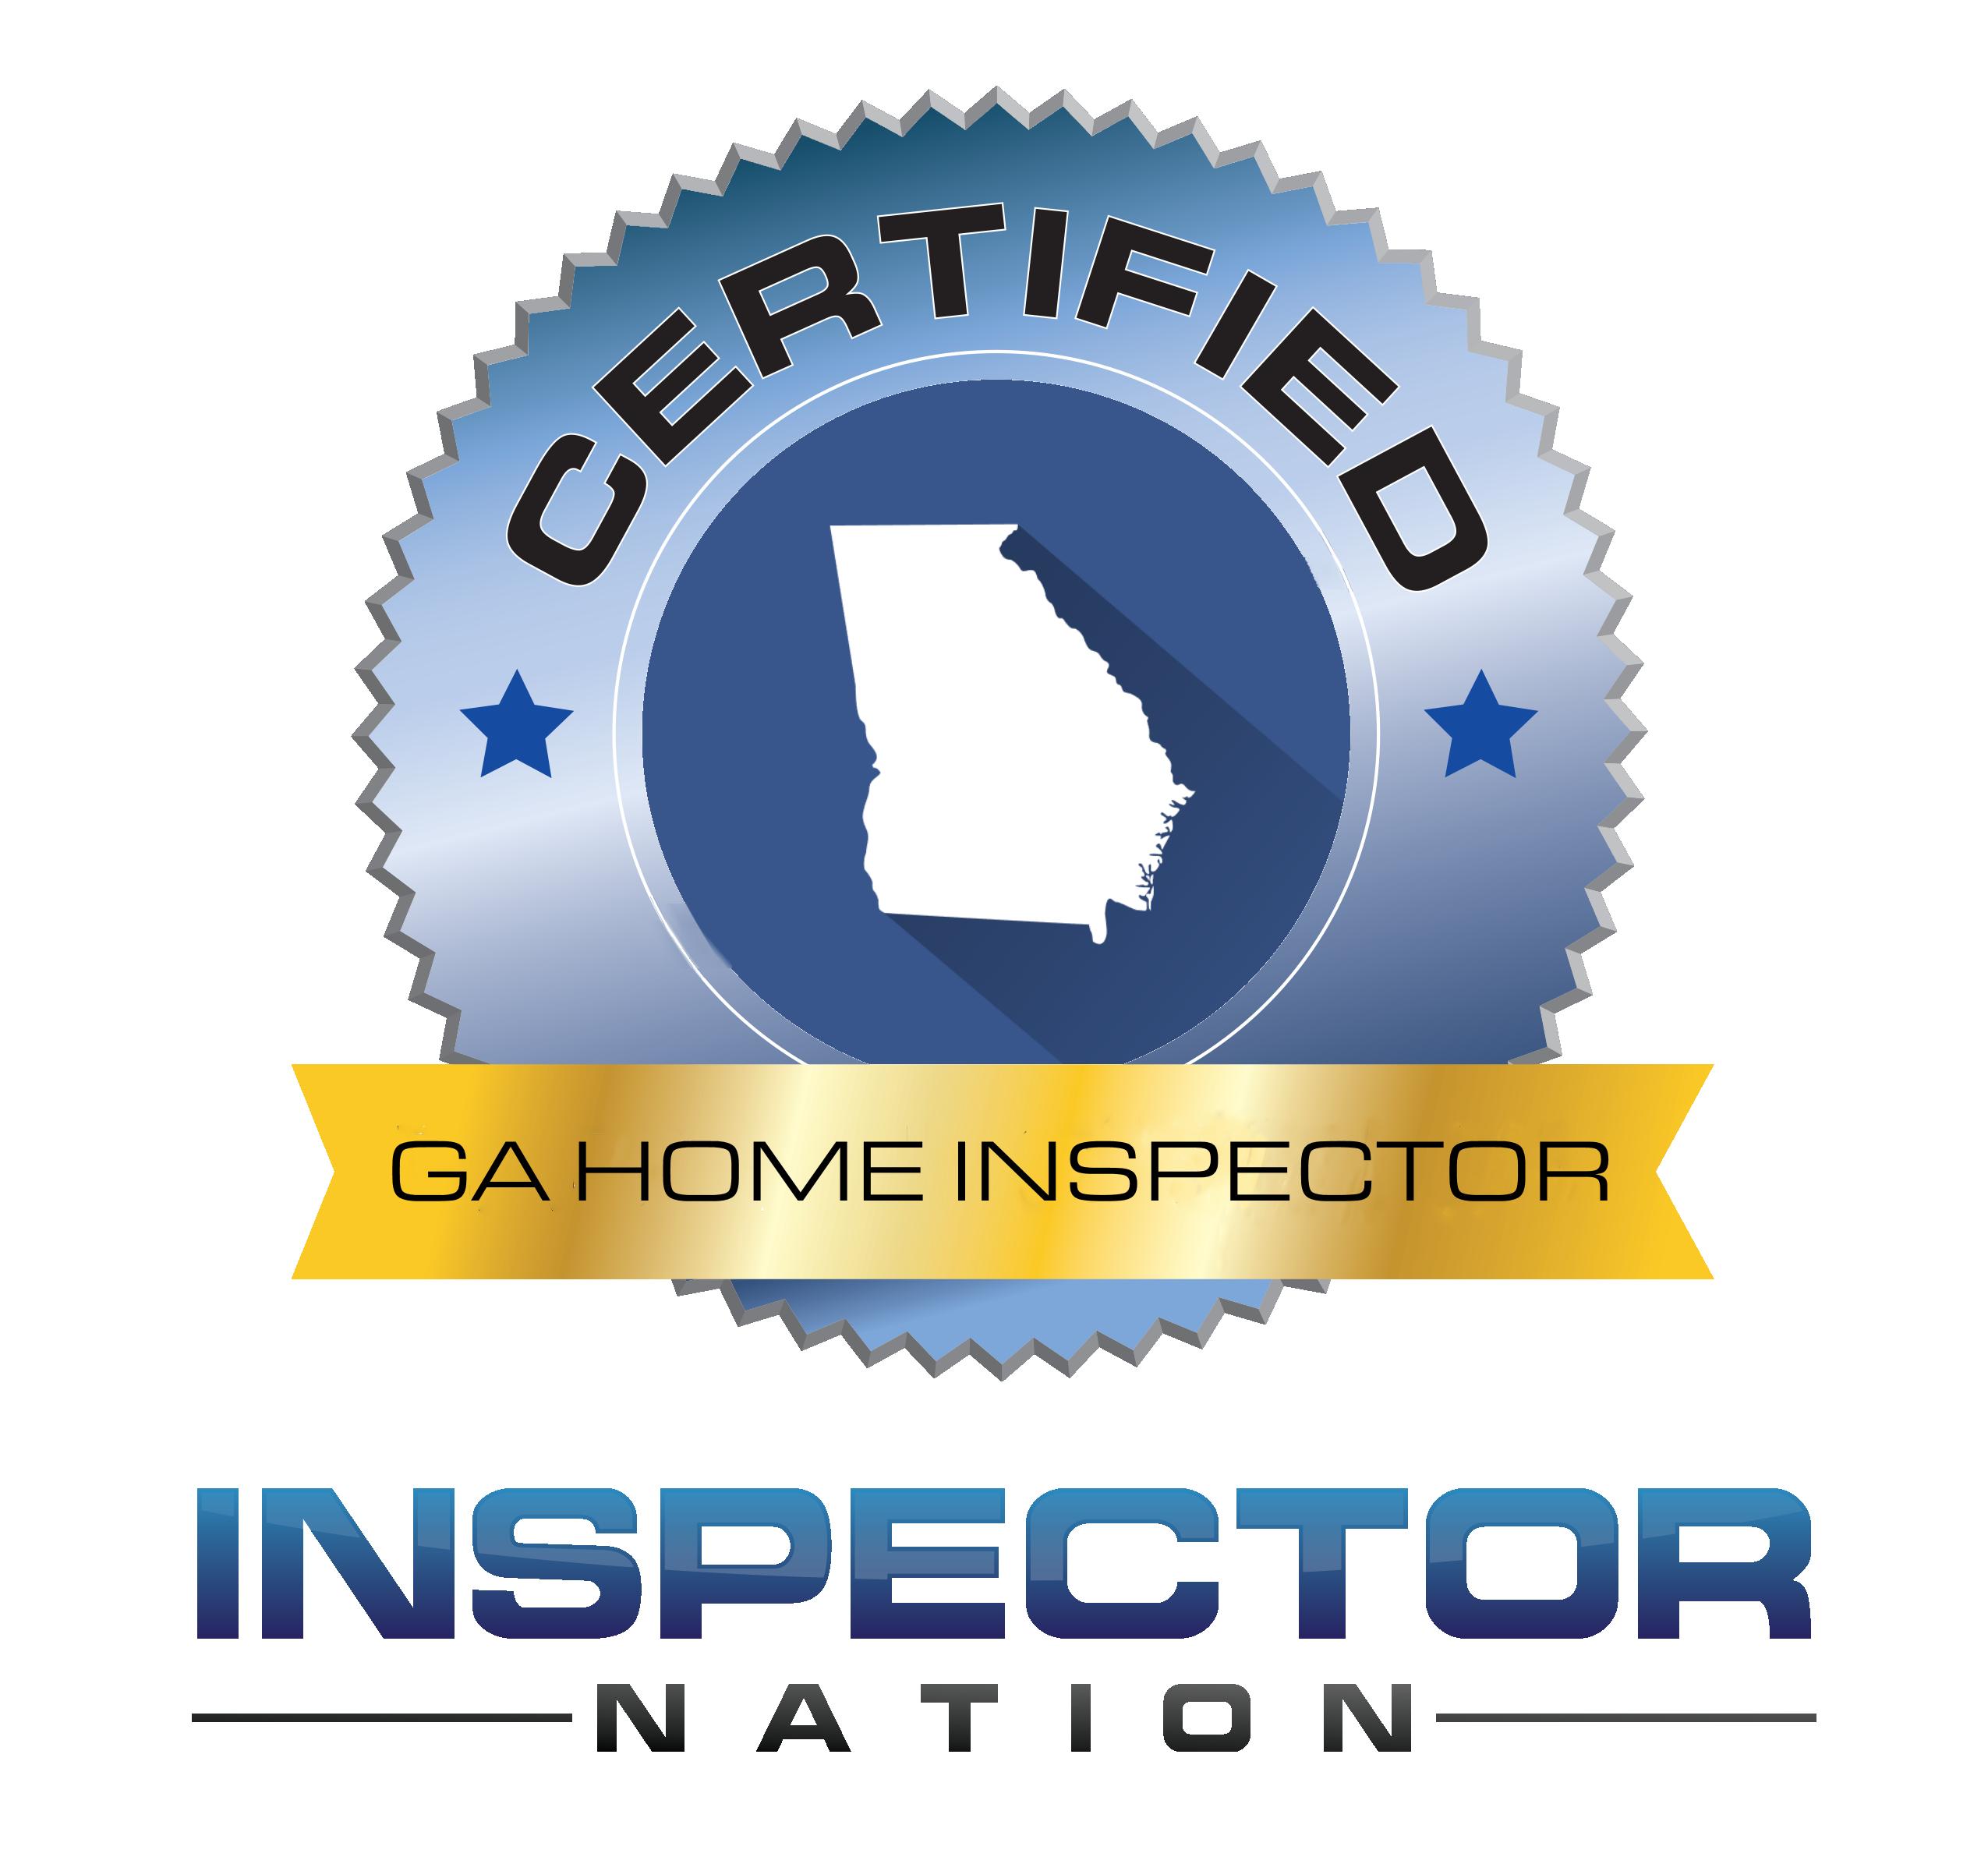 inspector nation certified home inspector badge georgia ga